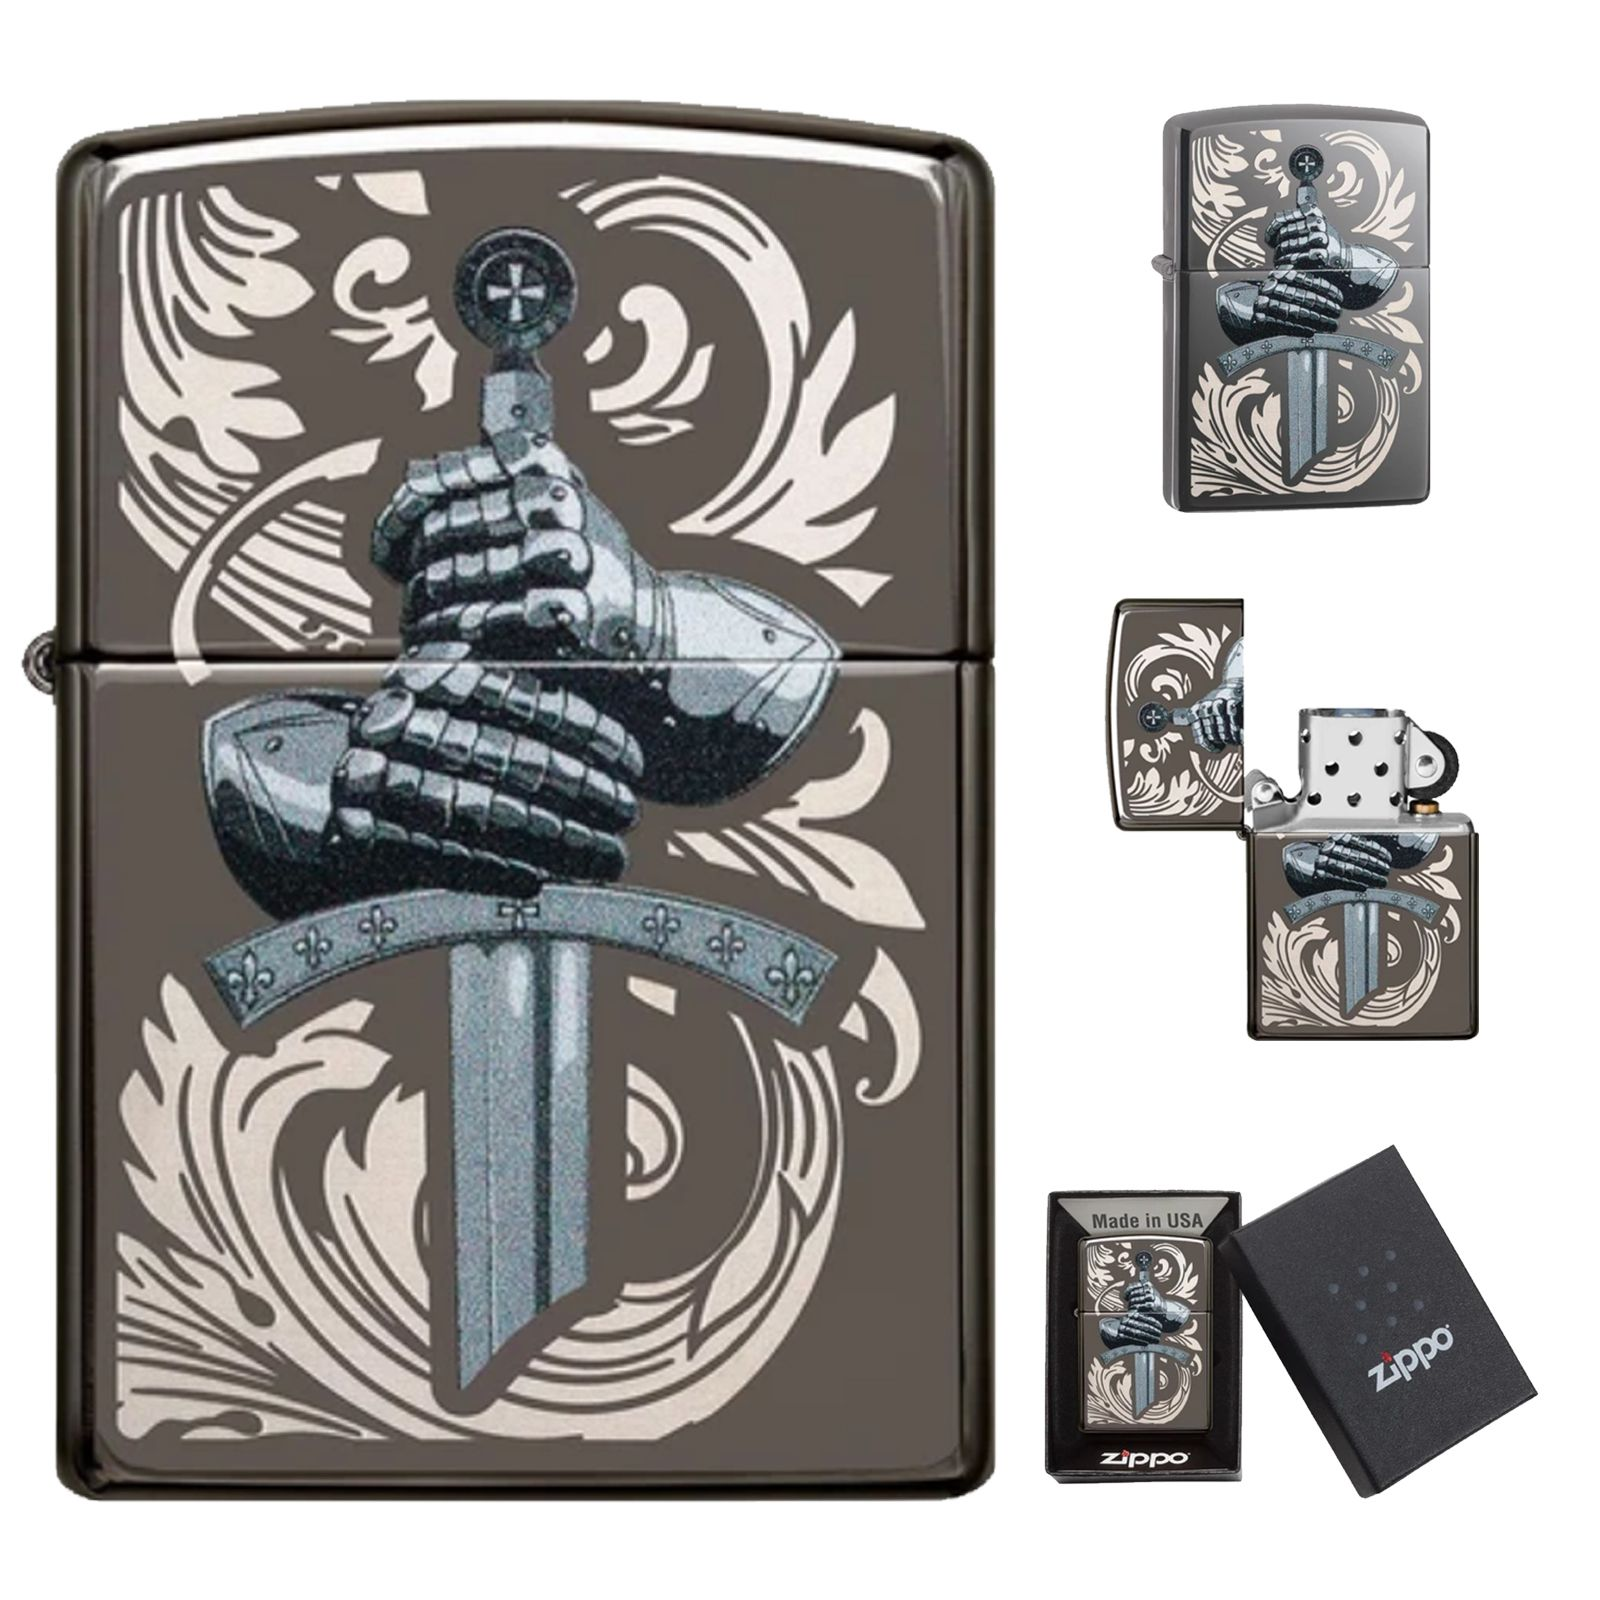 Zippo Lighter Knights Glove Design Sword Black Ice Brass Antique Windproof Gift In 2021 Zippo Lighter Zippo Lighter